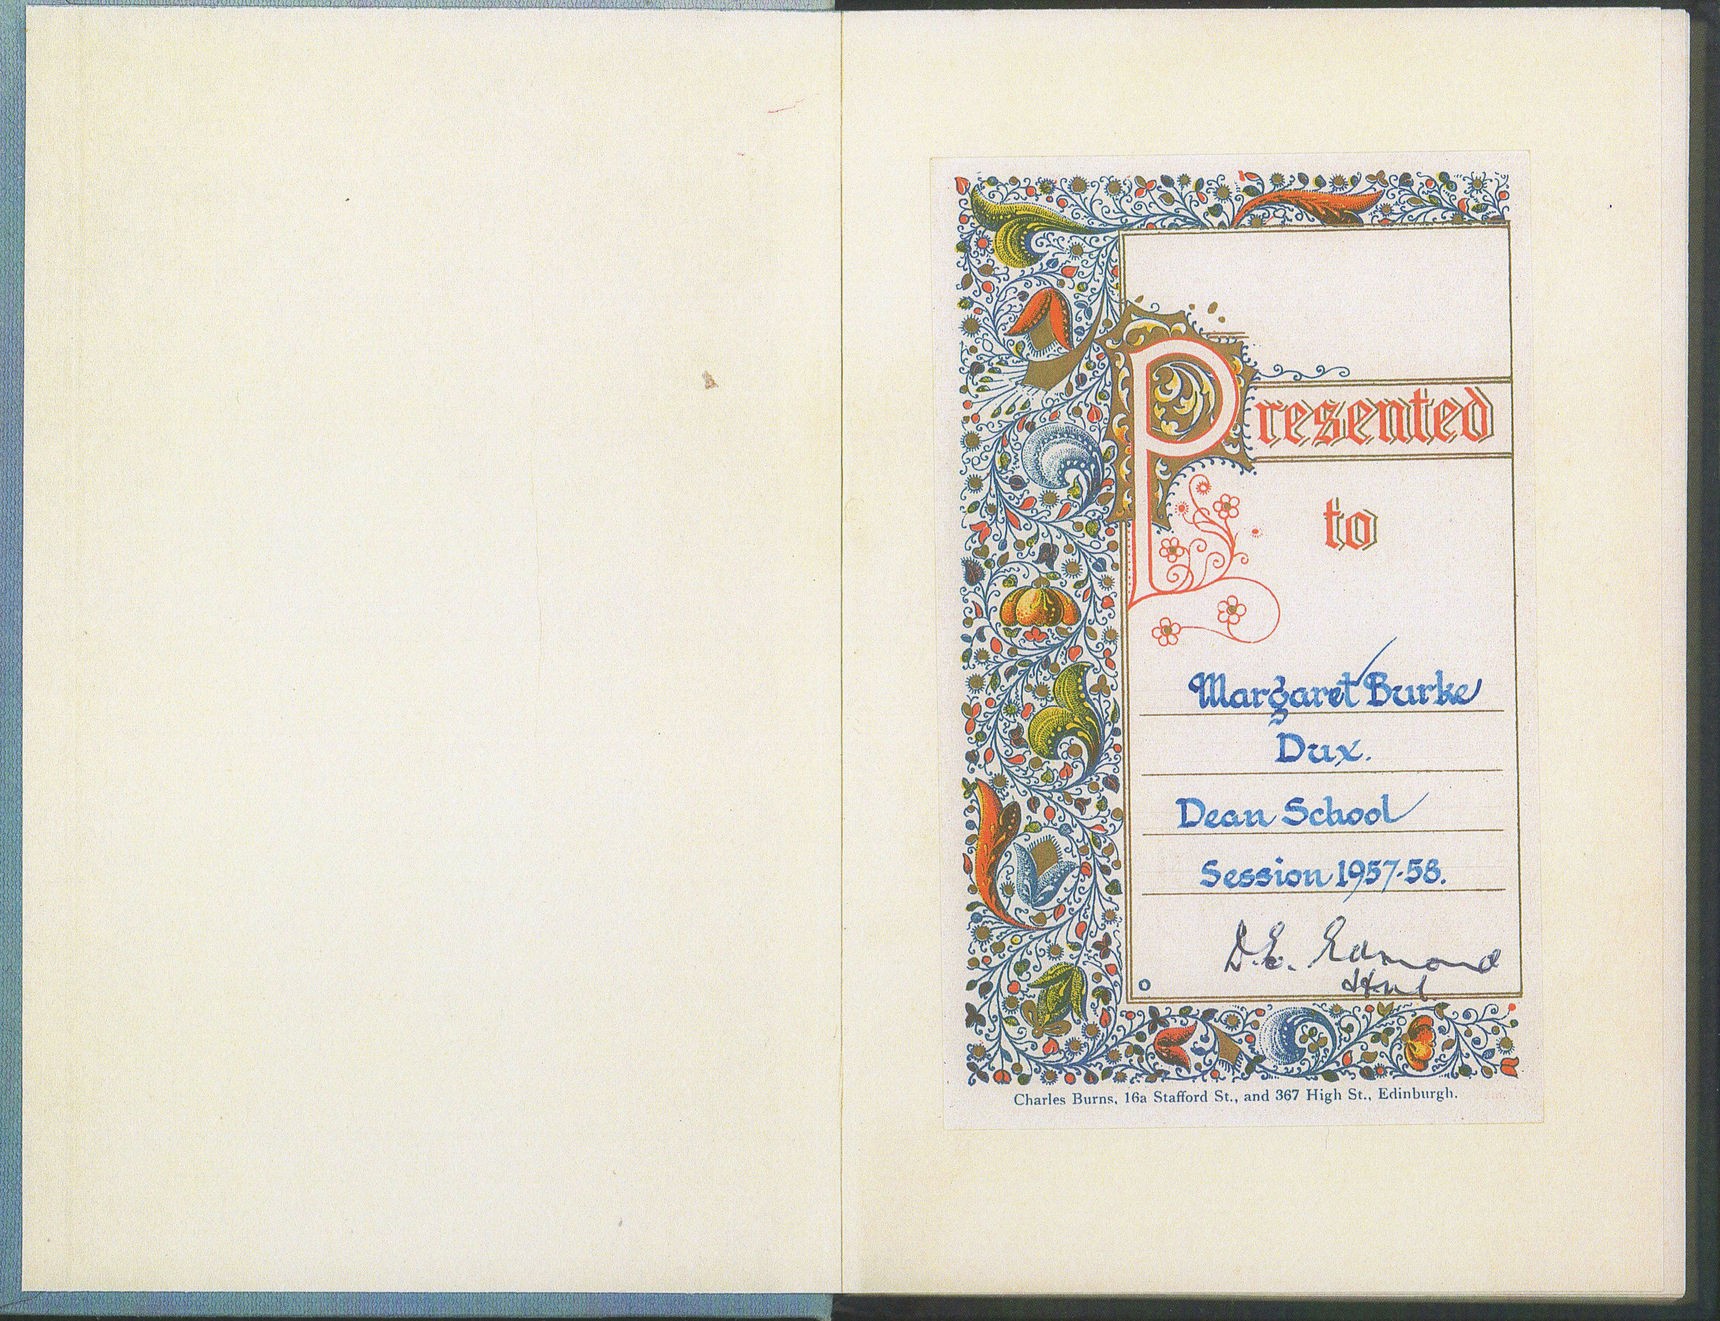 """ Presented to Margaret Burke Dux Dean School Session 1957 - 58 """